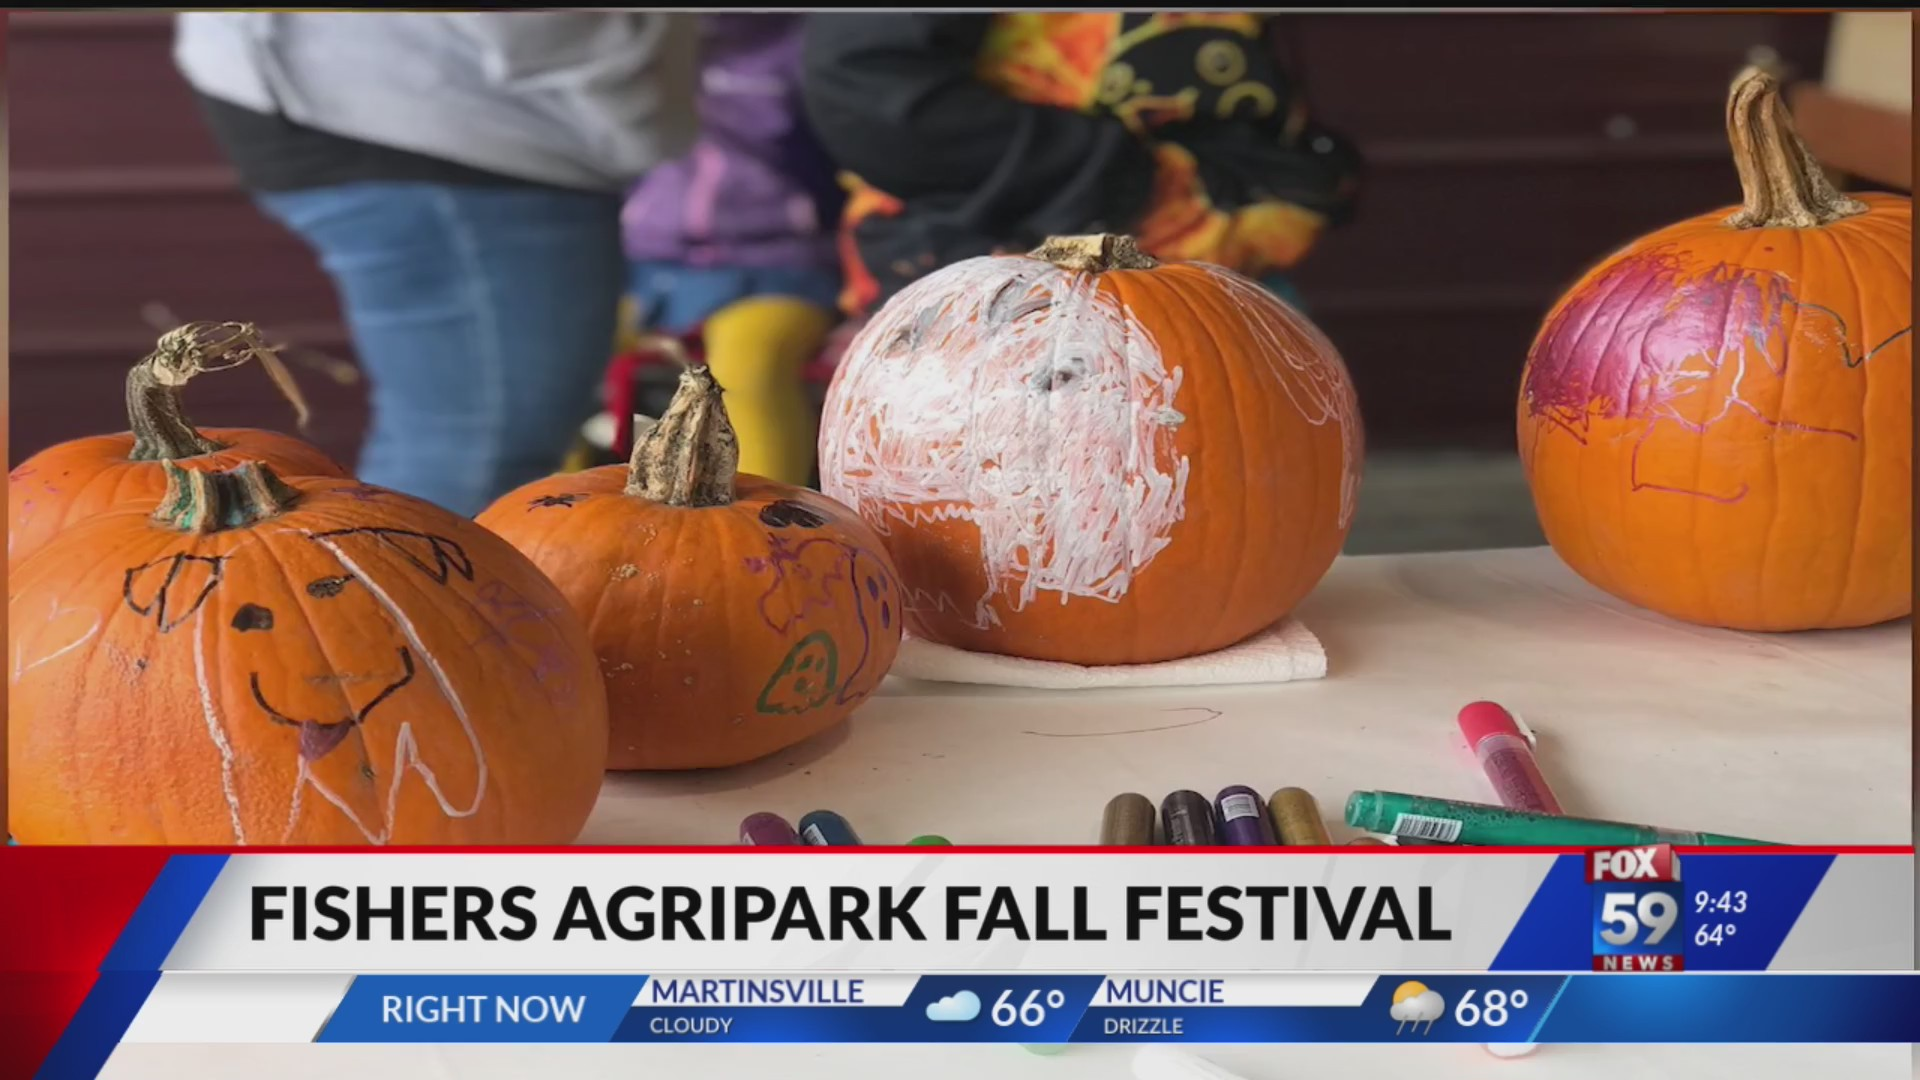 AgriPark fall festival kicks off